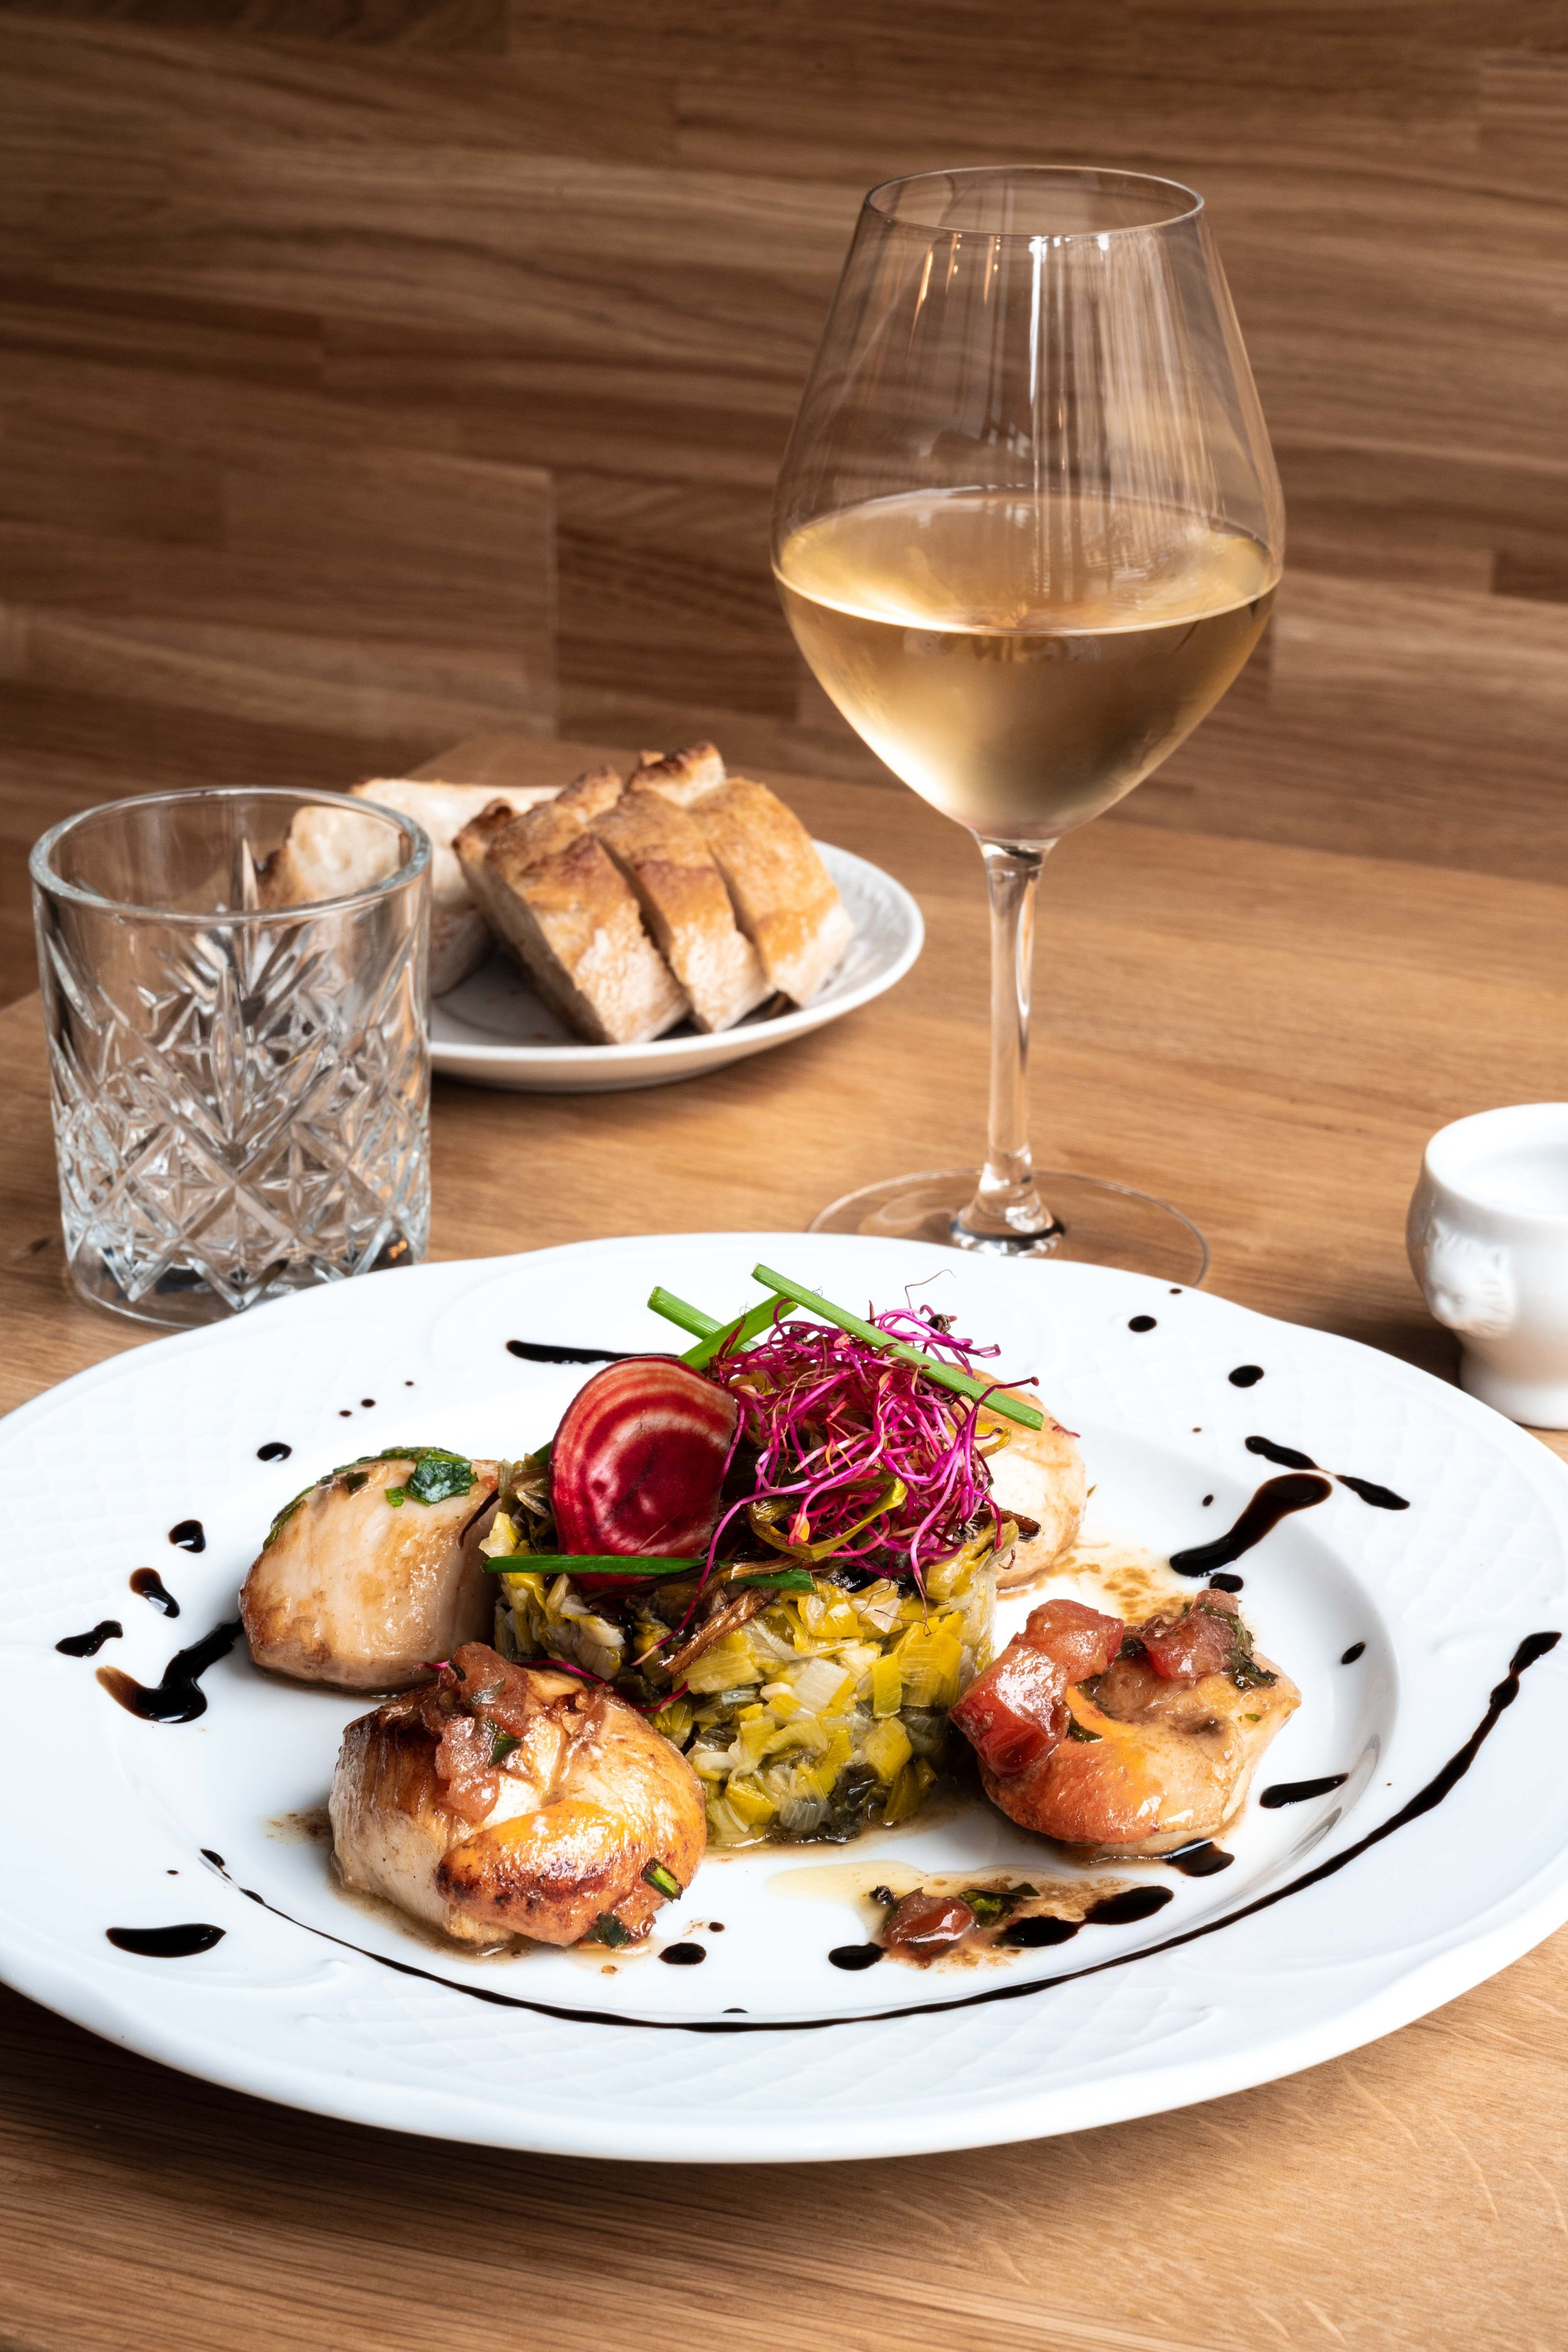 Jacques_Restaurant_by©Edouard_Auffray-Benjamin_Konrad Food 2-2-13.JPG